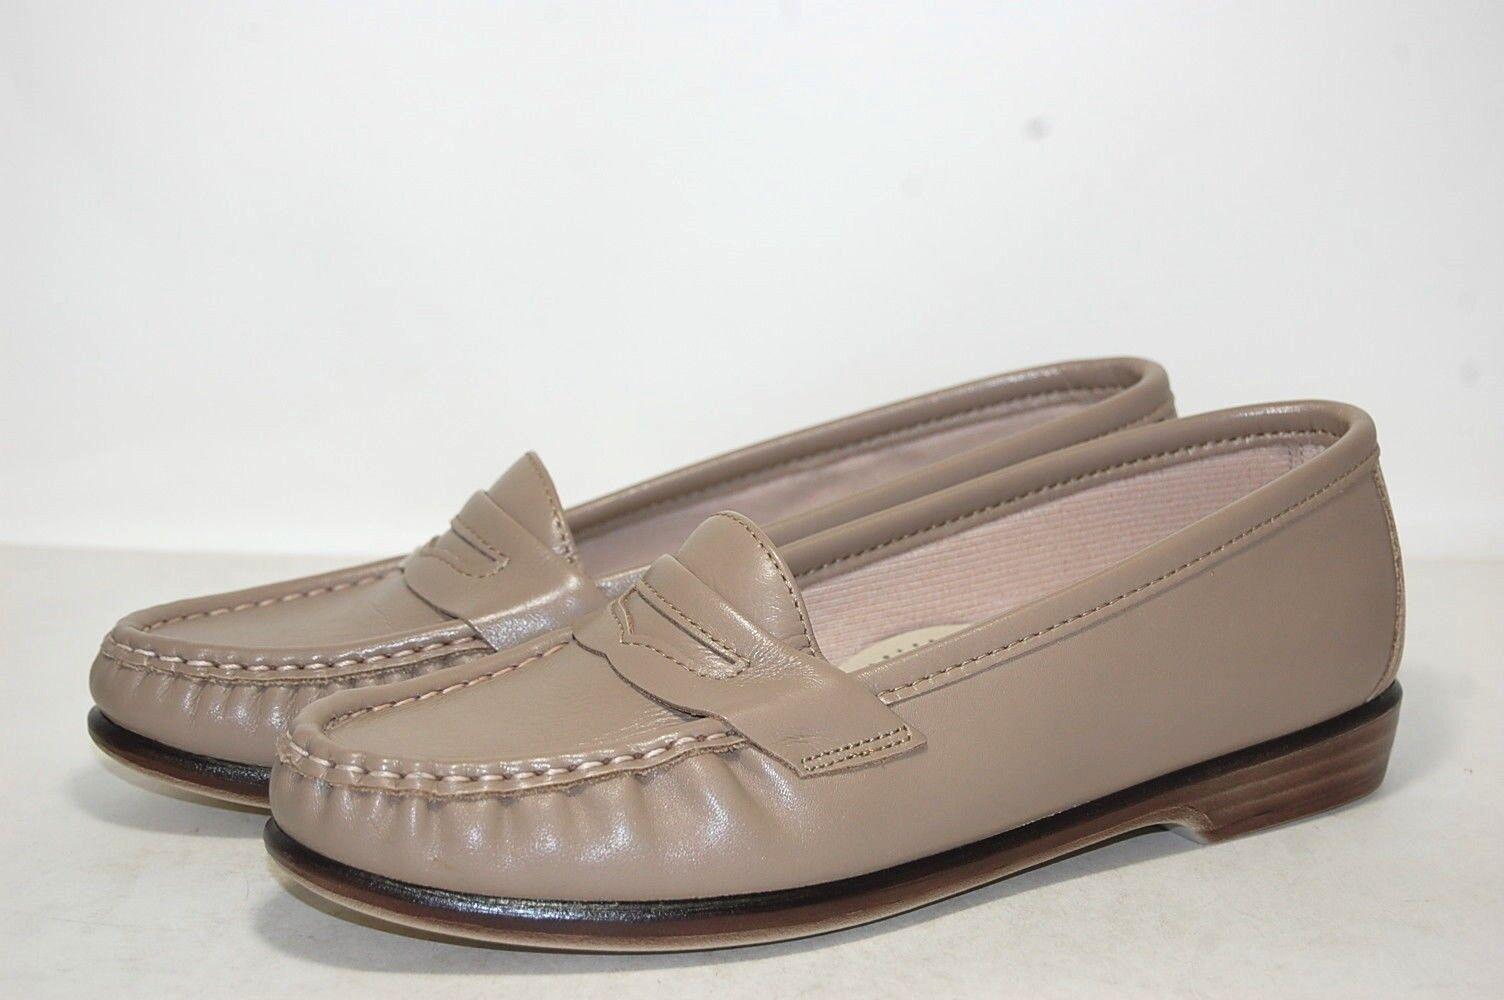 Original SAS Wink Mocha Leather Leather Leather W wide 0094-015 Women cacada